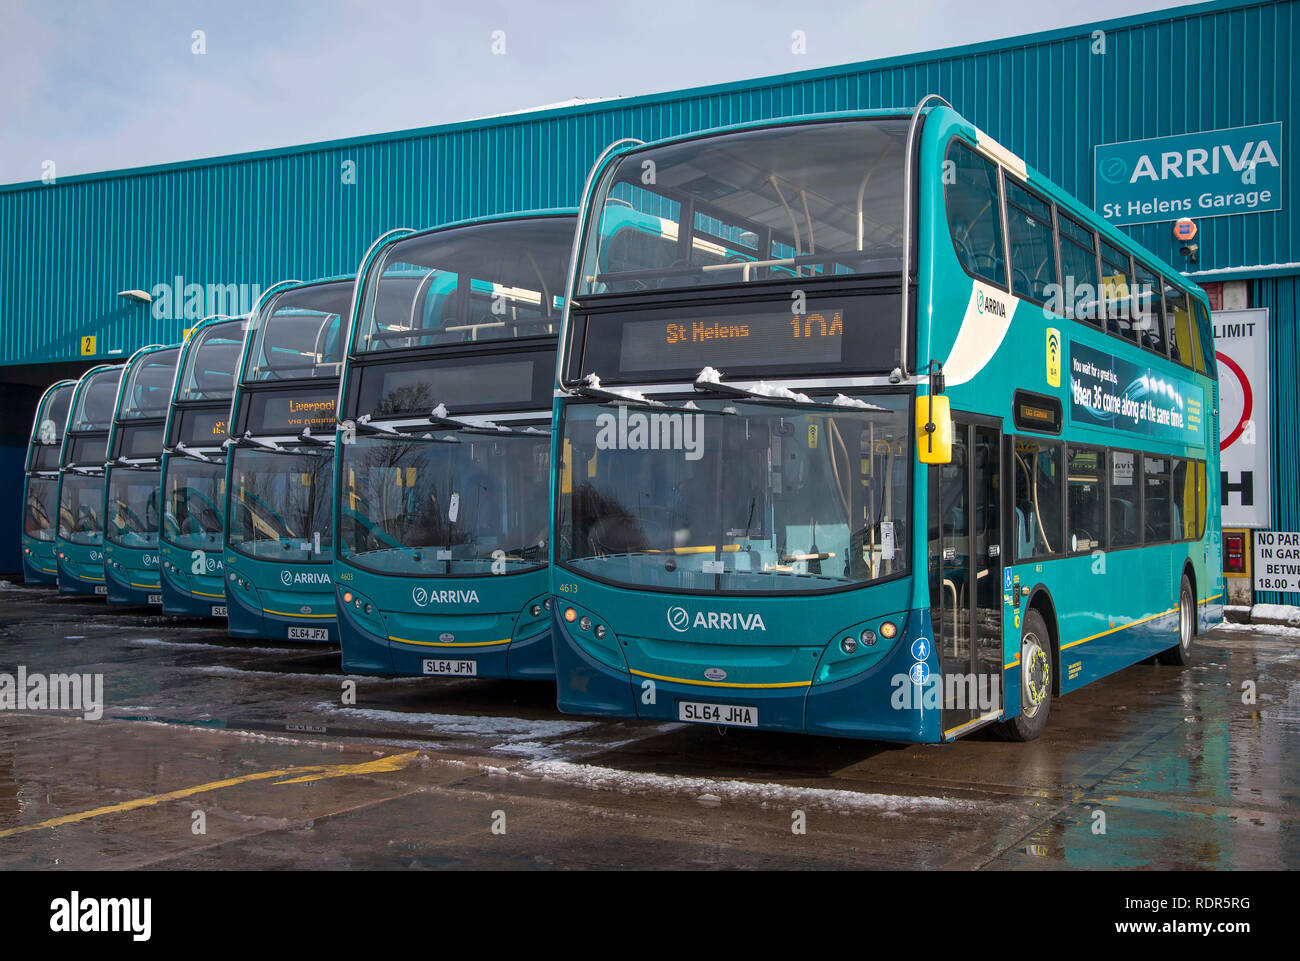 Arriva Double Decks buses. - Stock Image